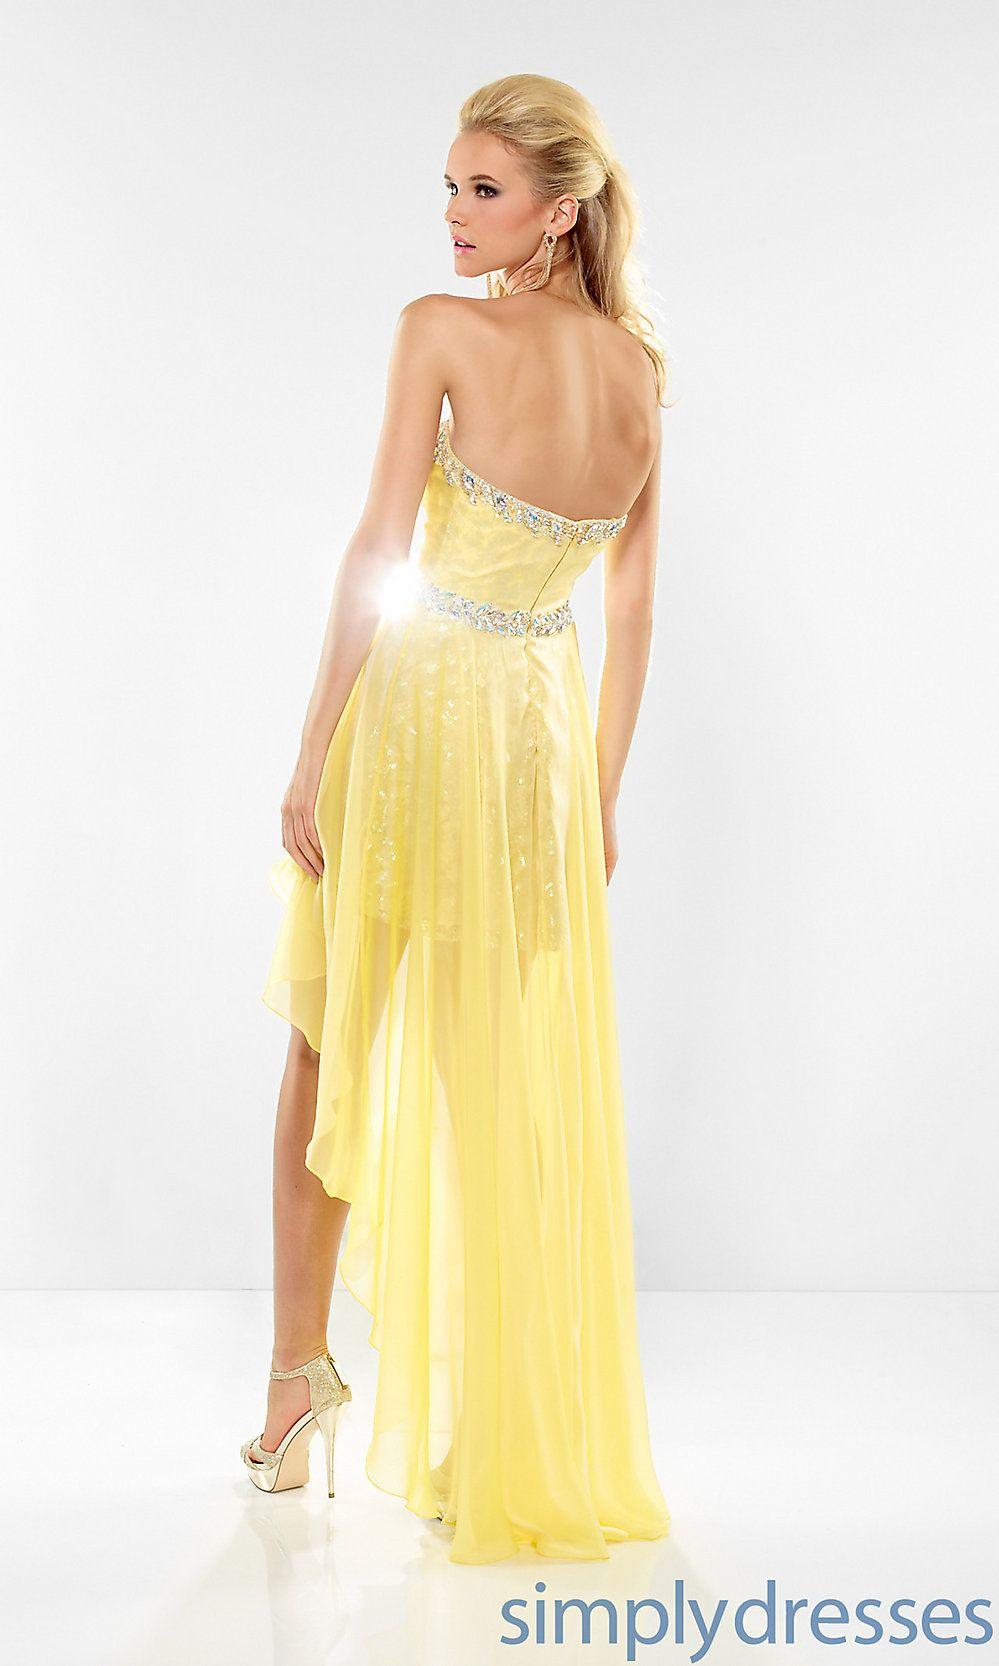 Yellow dress for women  Yellow Dress  Women  Pinterest  Yellow dress